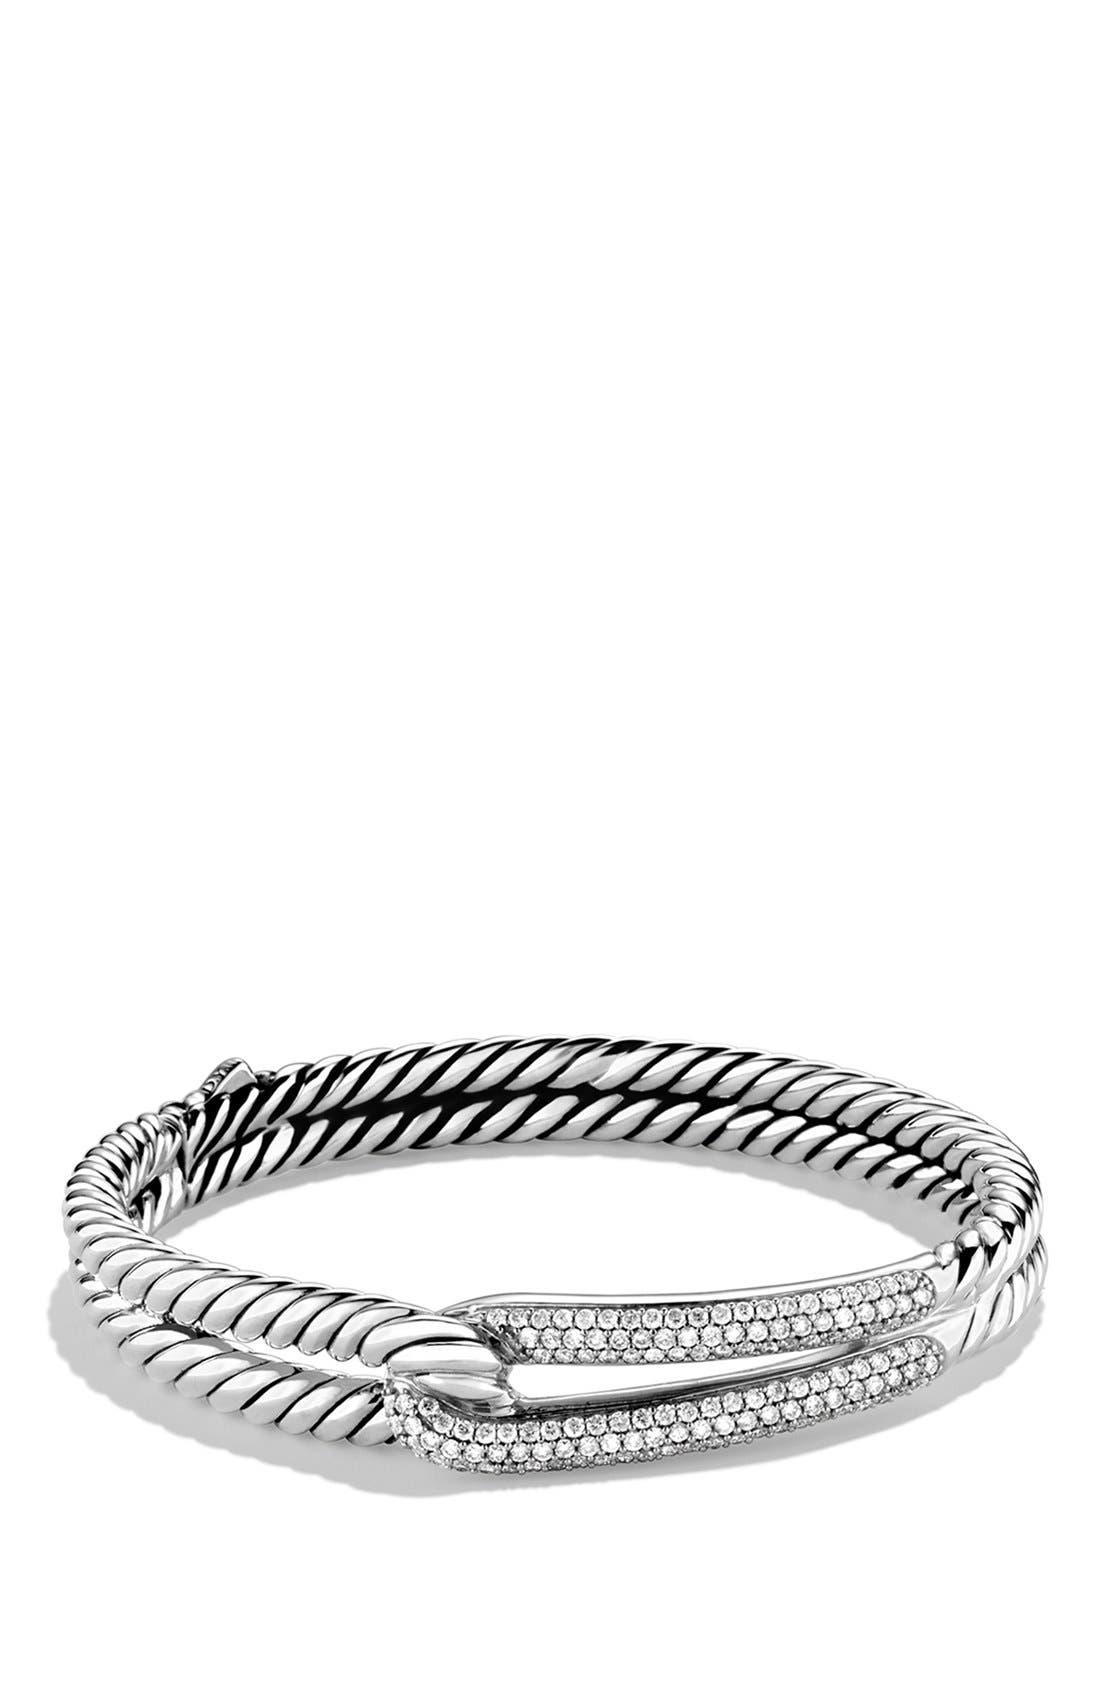 Alternate Image 1 Selected - David Yurman 'Labyrinth' Single-Loop Bracelet with Diamonds